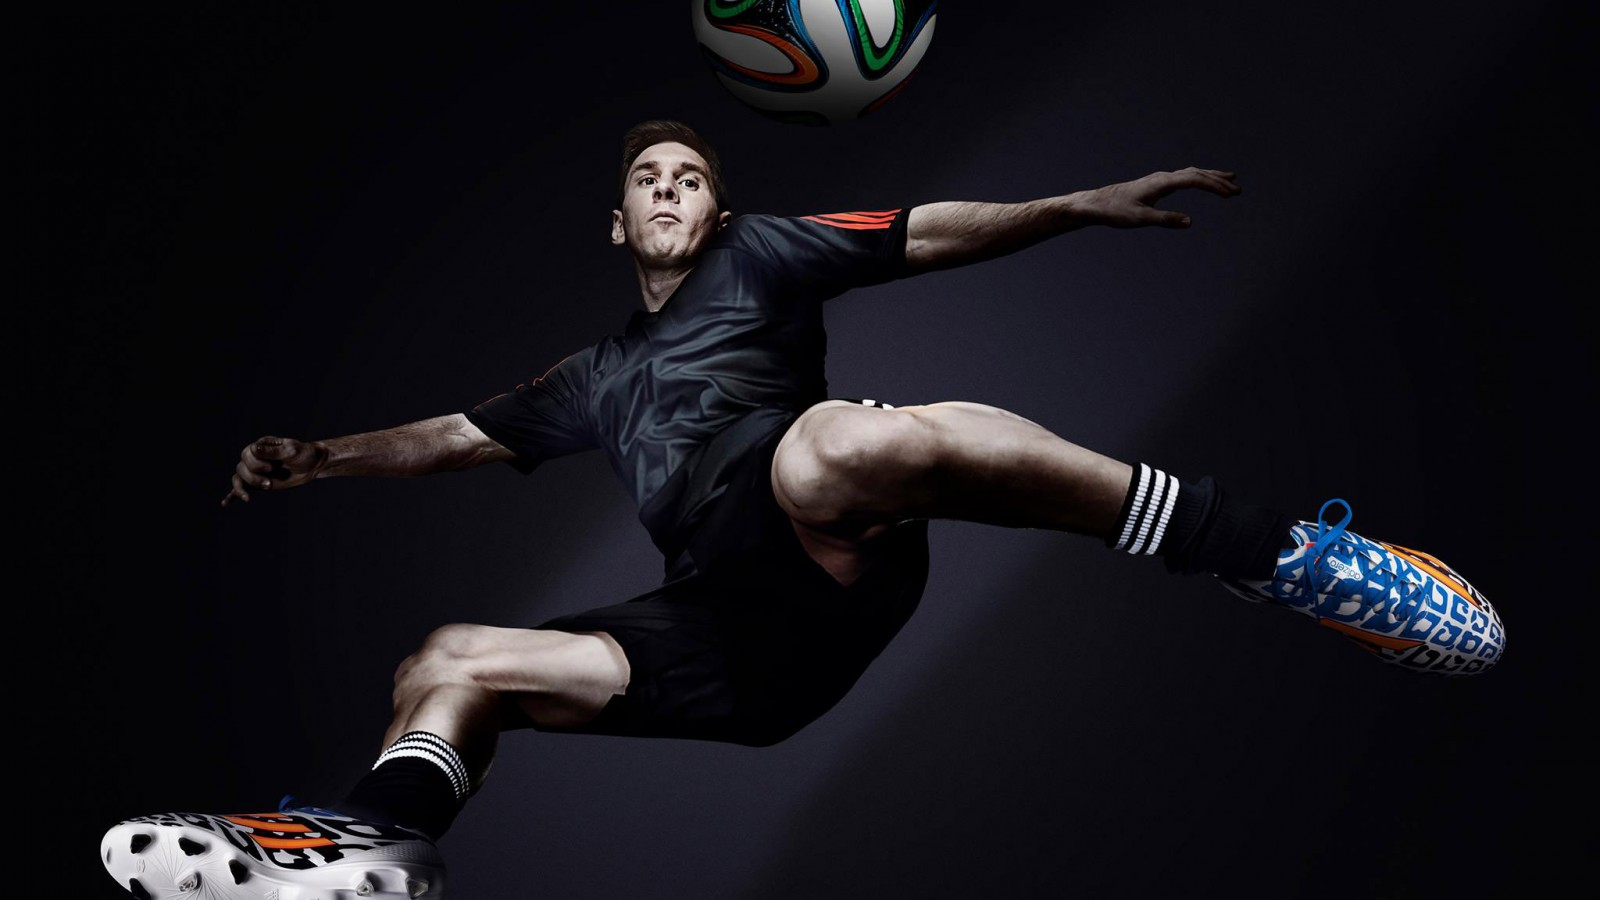 Leo Messi Adidas Hd Wallpaper Image Wallpapers 1600x900